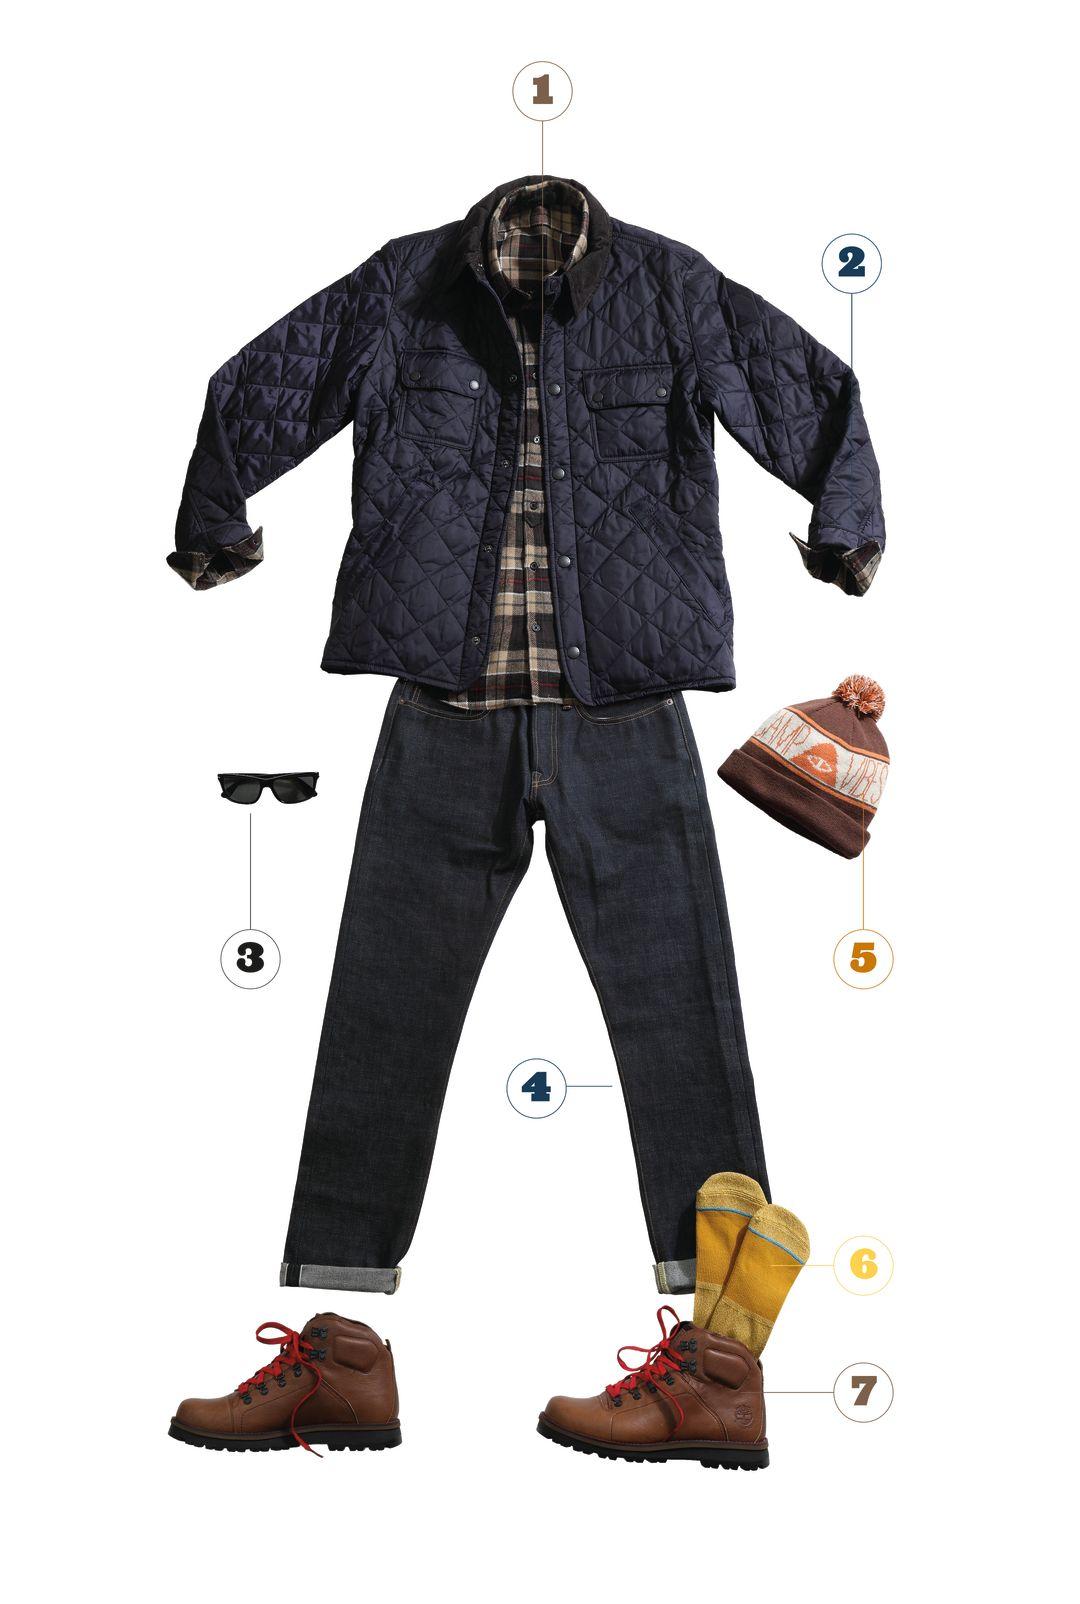 Pcwi 16 wardrobe check mate iuw04n